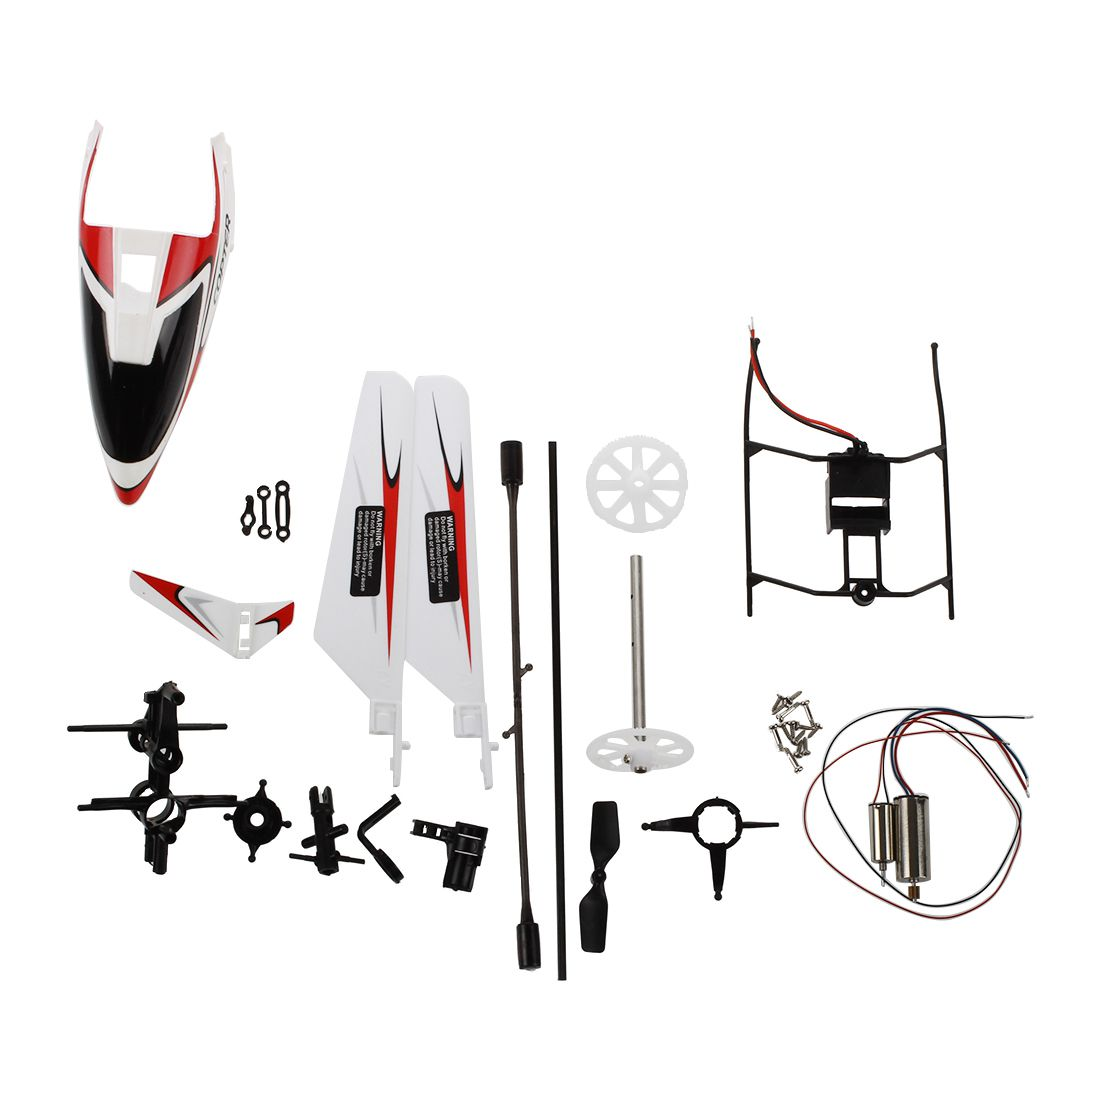 V911helicopterAccessorieskitwithengines/screws